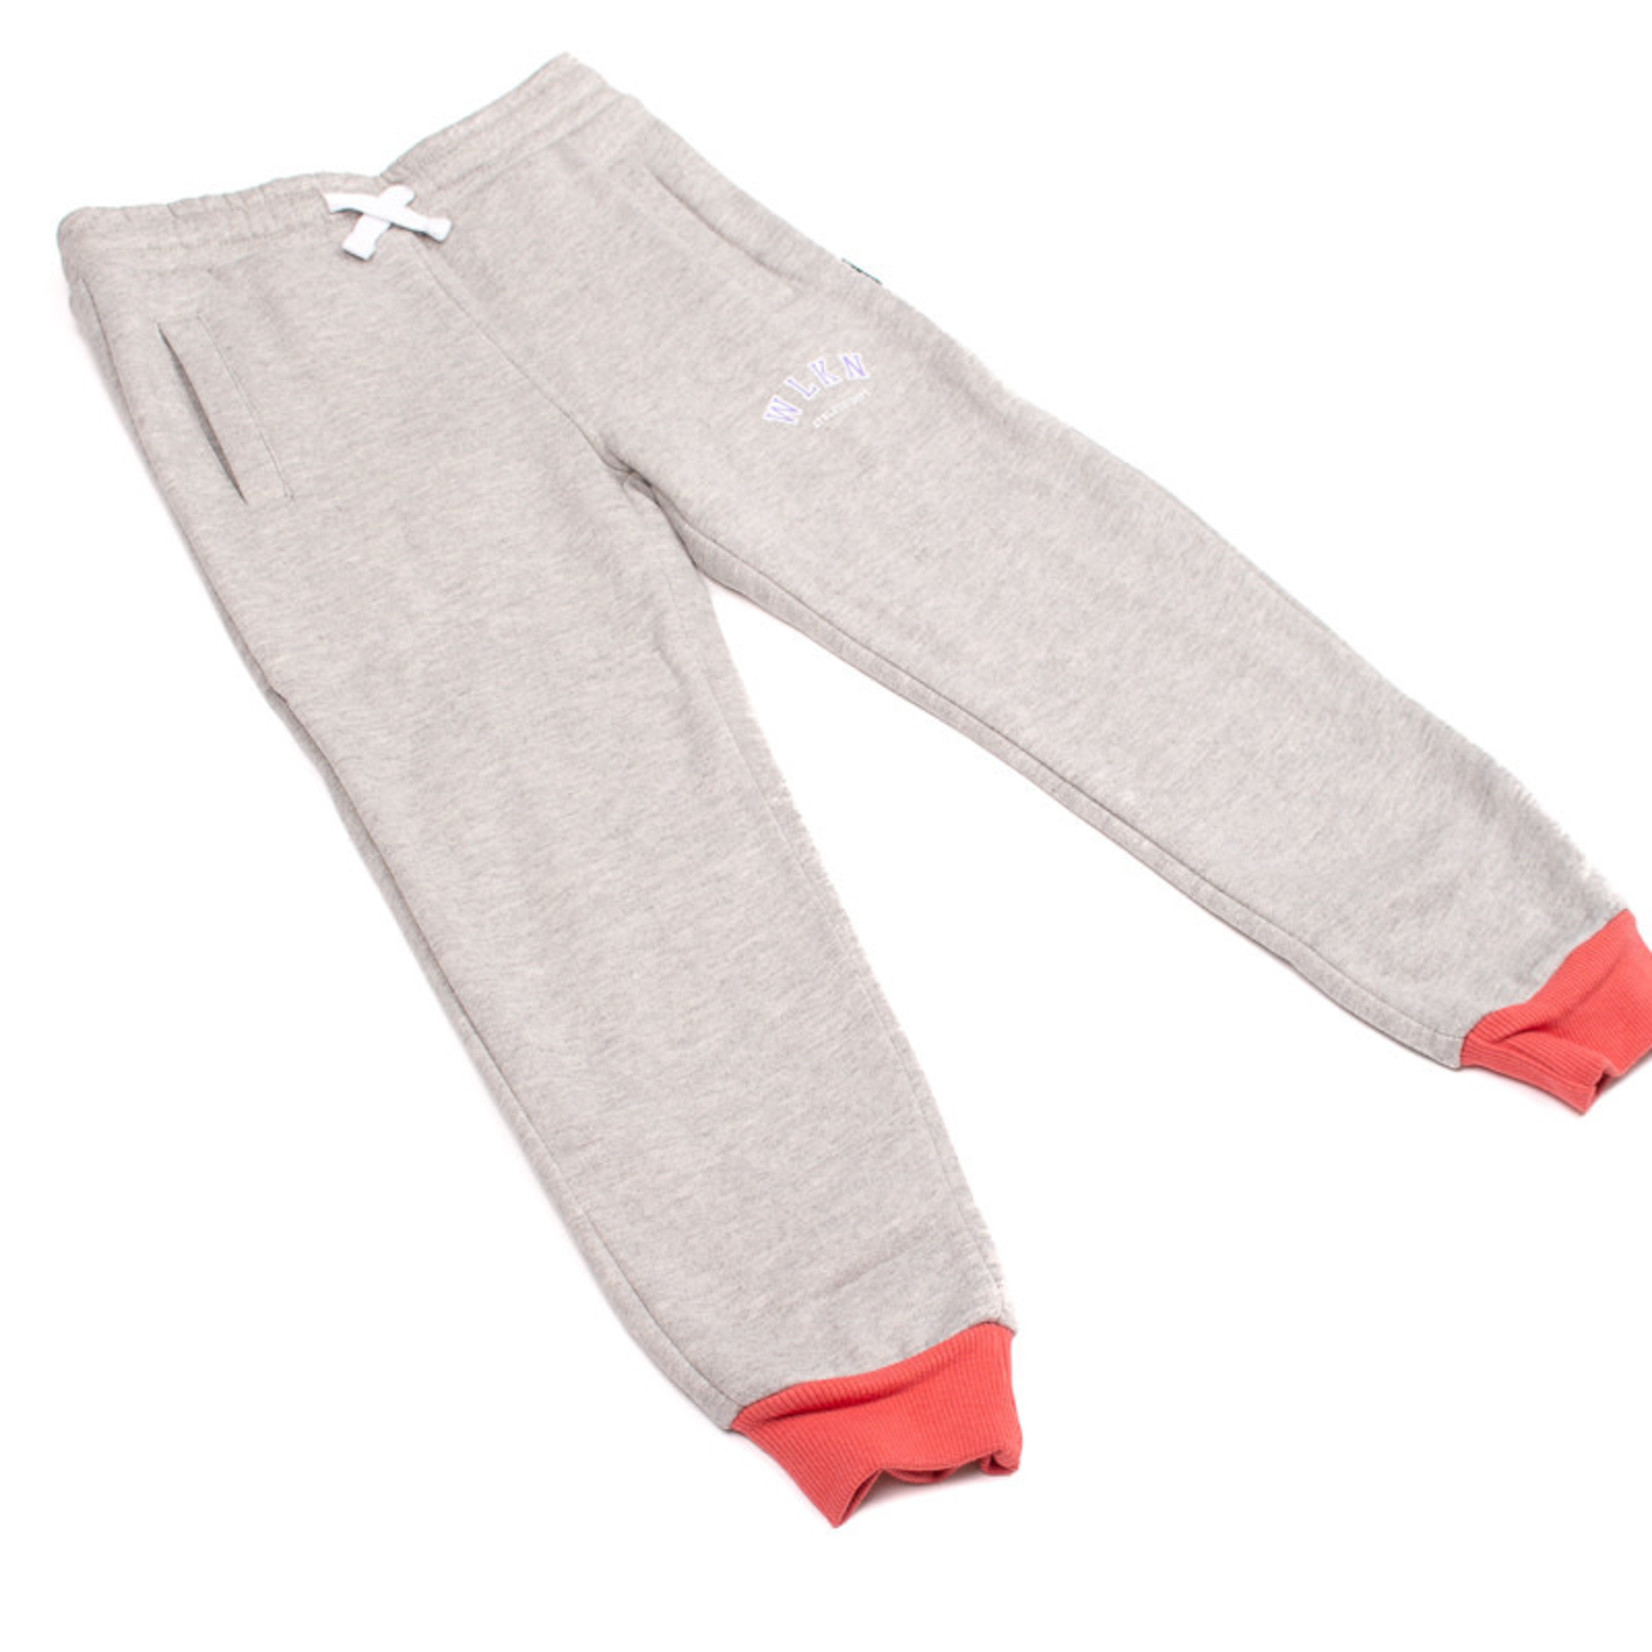 WLKN WLKN : Junior College Sweatpants